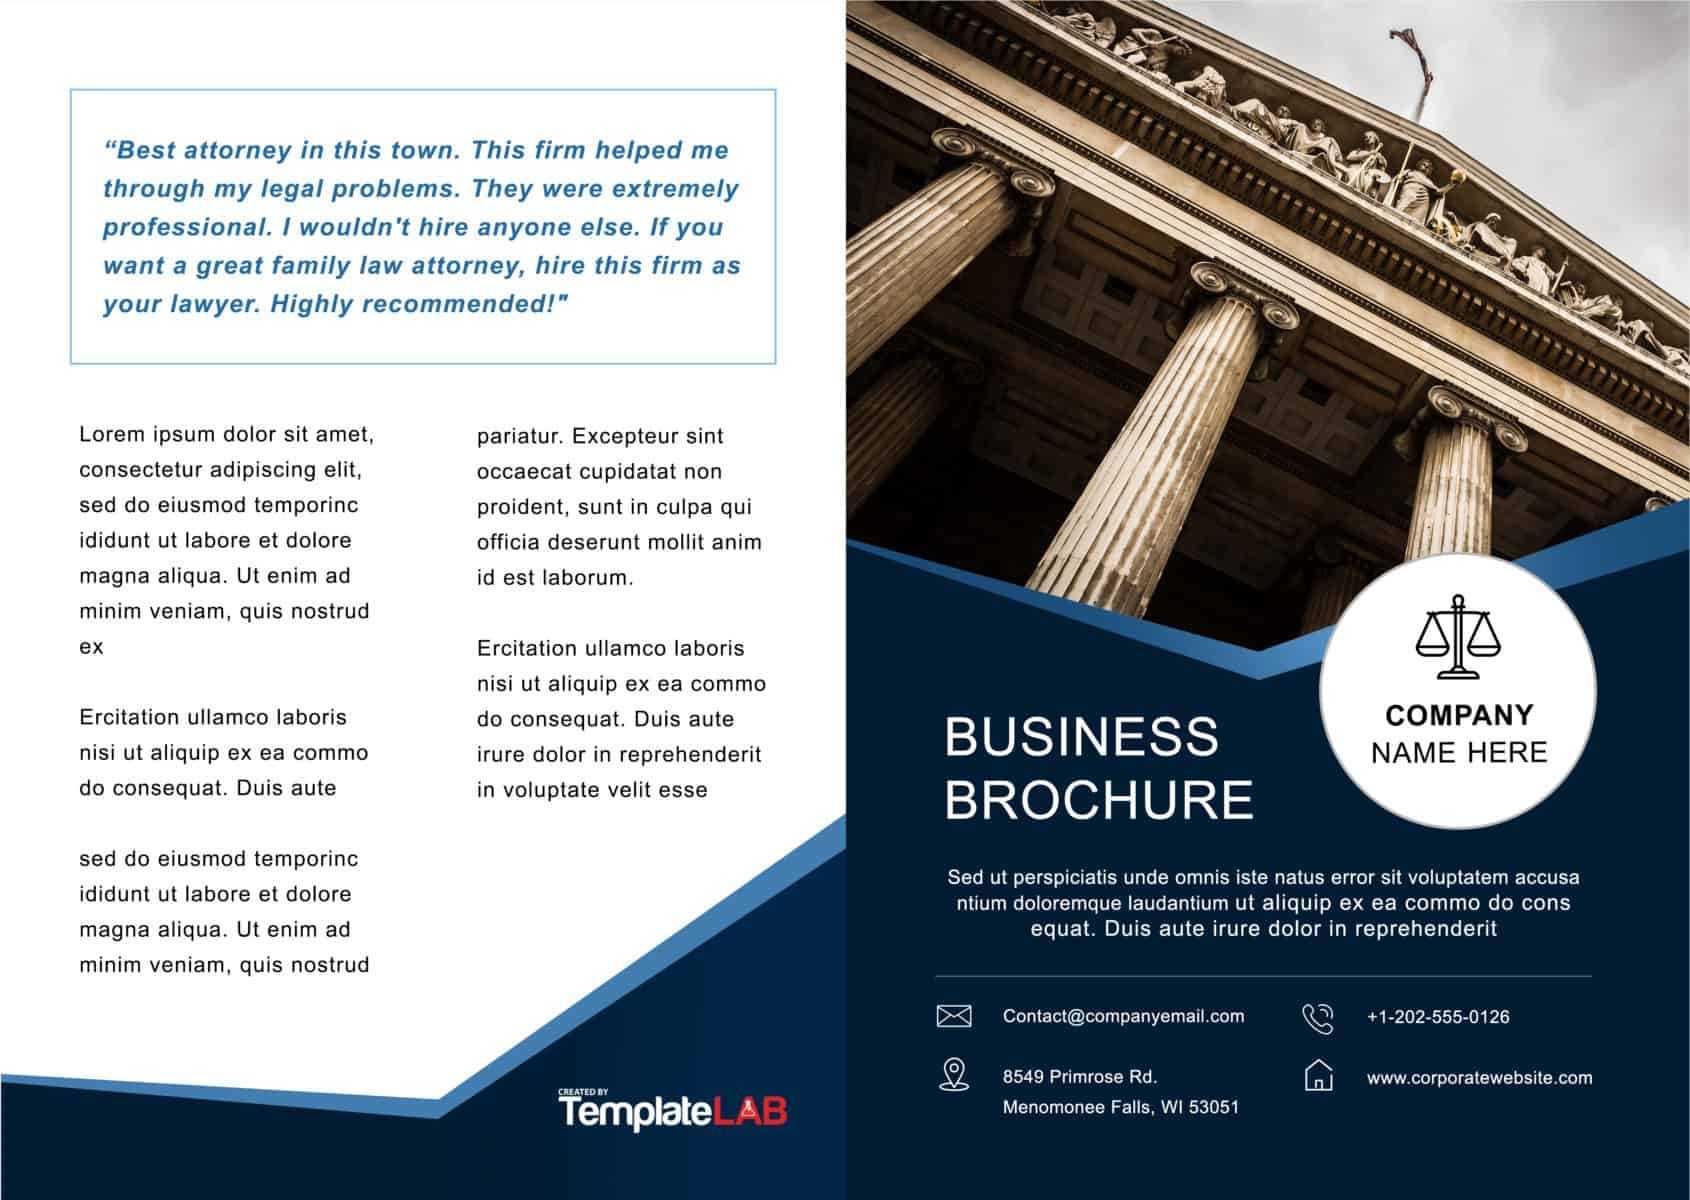 33 Free Brochure Templates (Word + Pdf) ᐅ Template Lab for Online Brochure Template Free